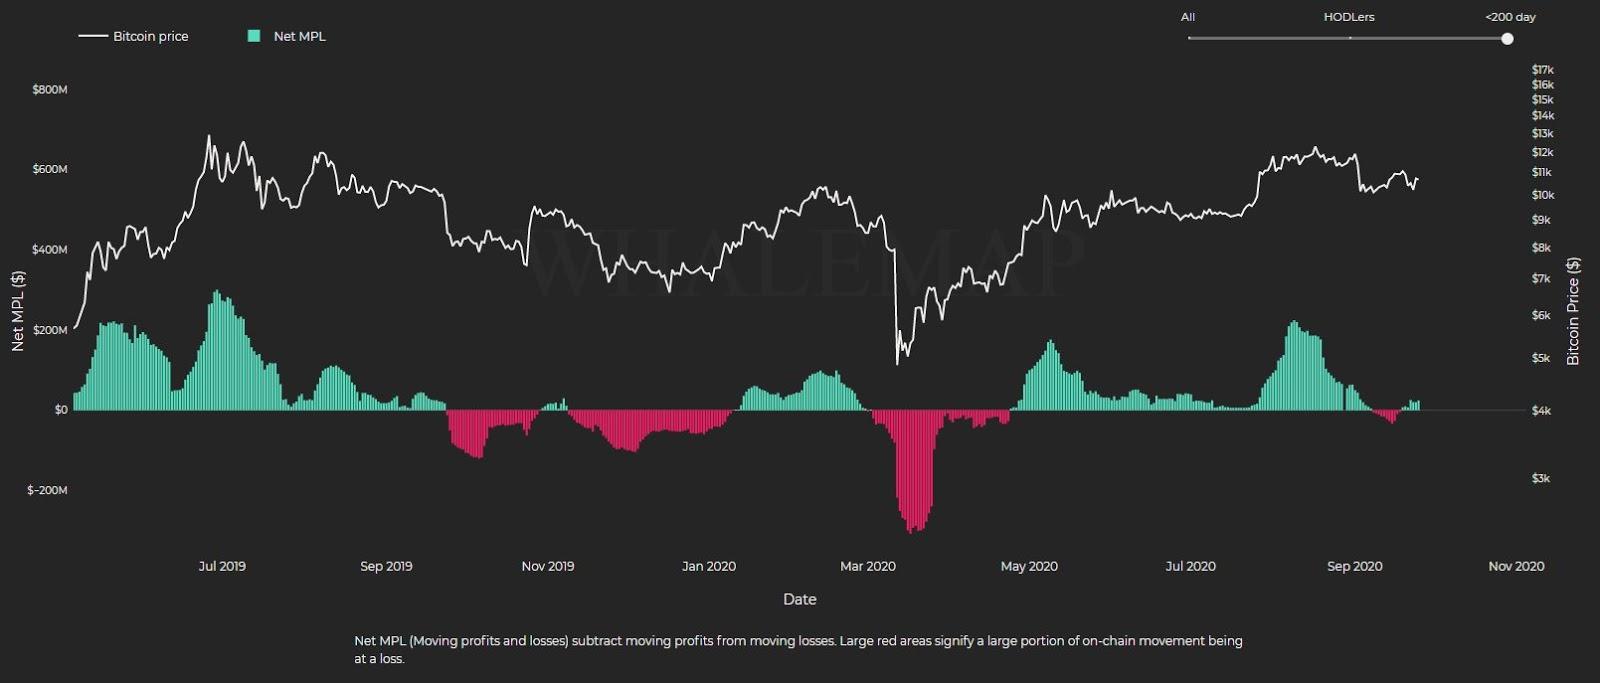 Bitcoin net MPL indicator